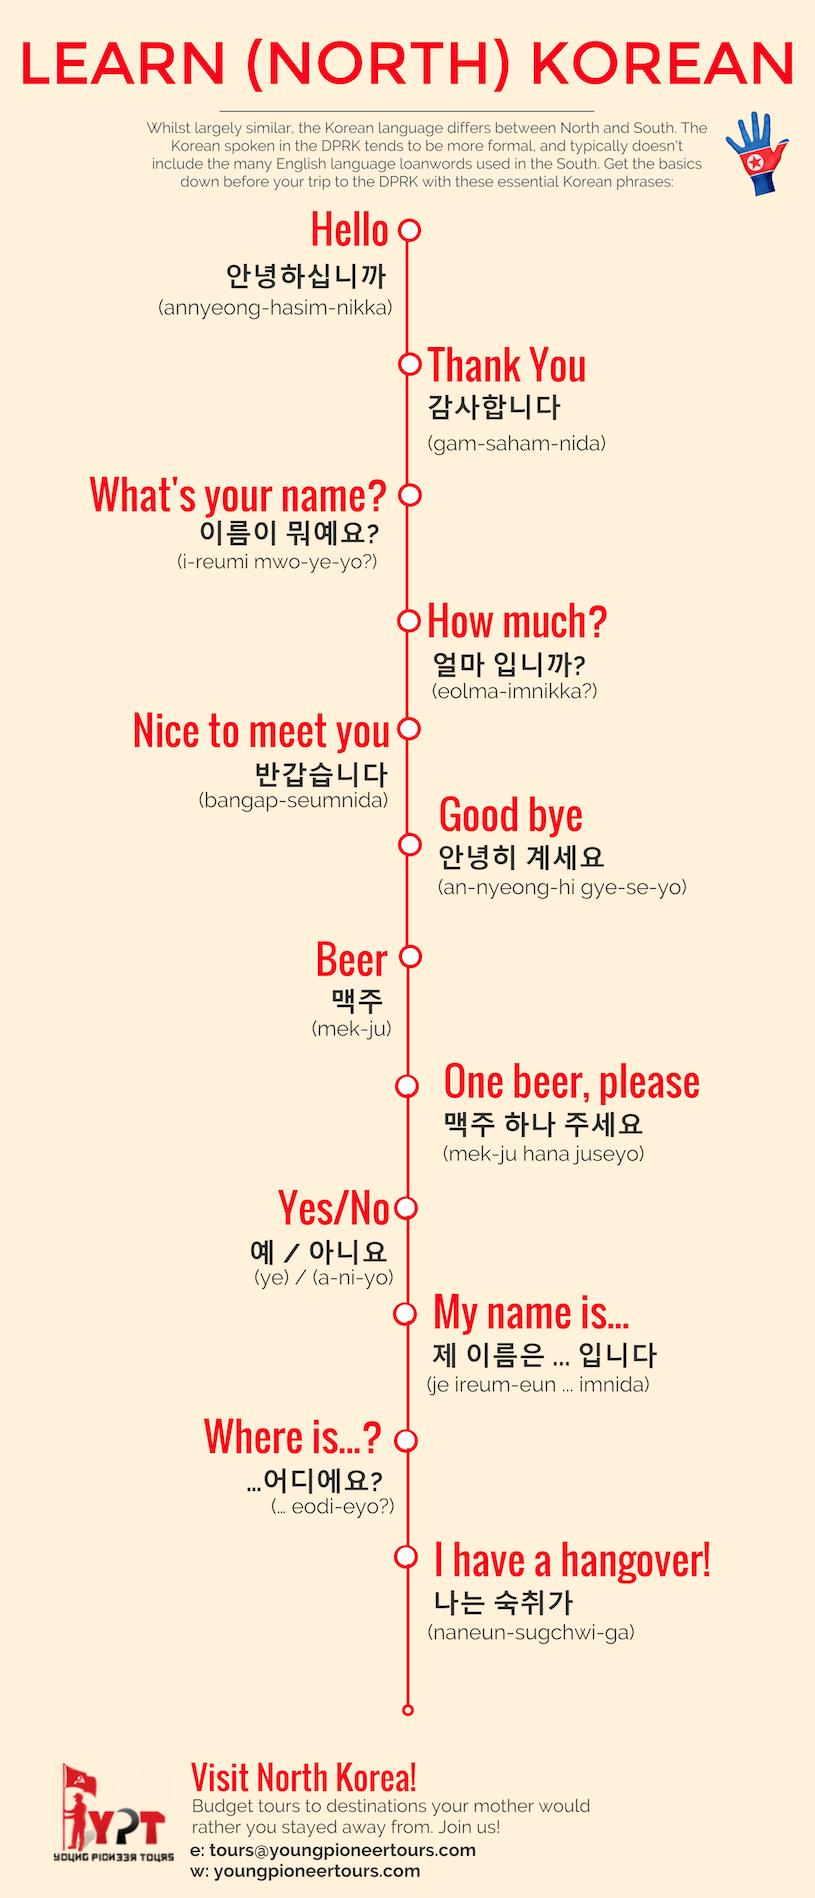 north korea language infographic